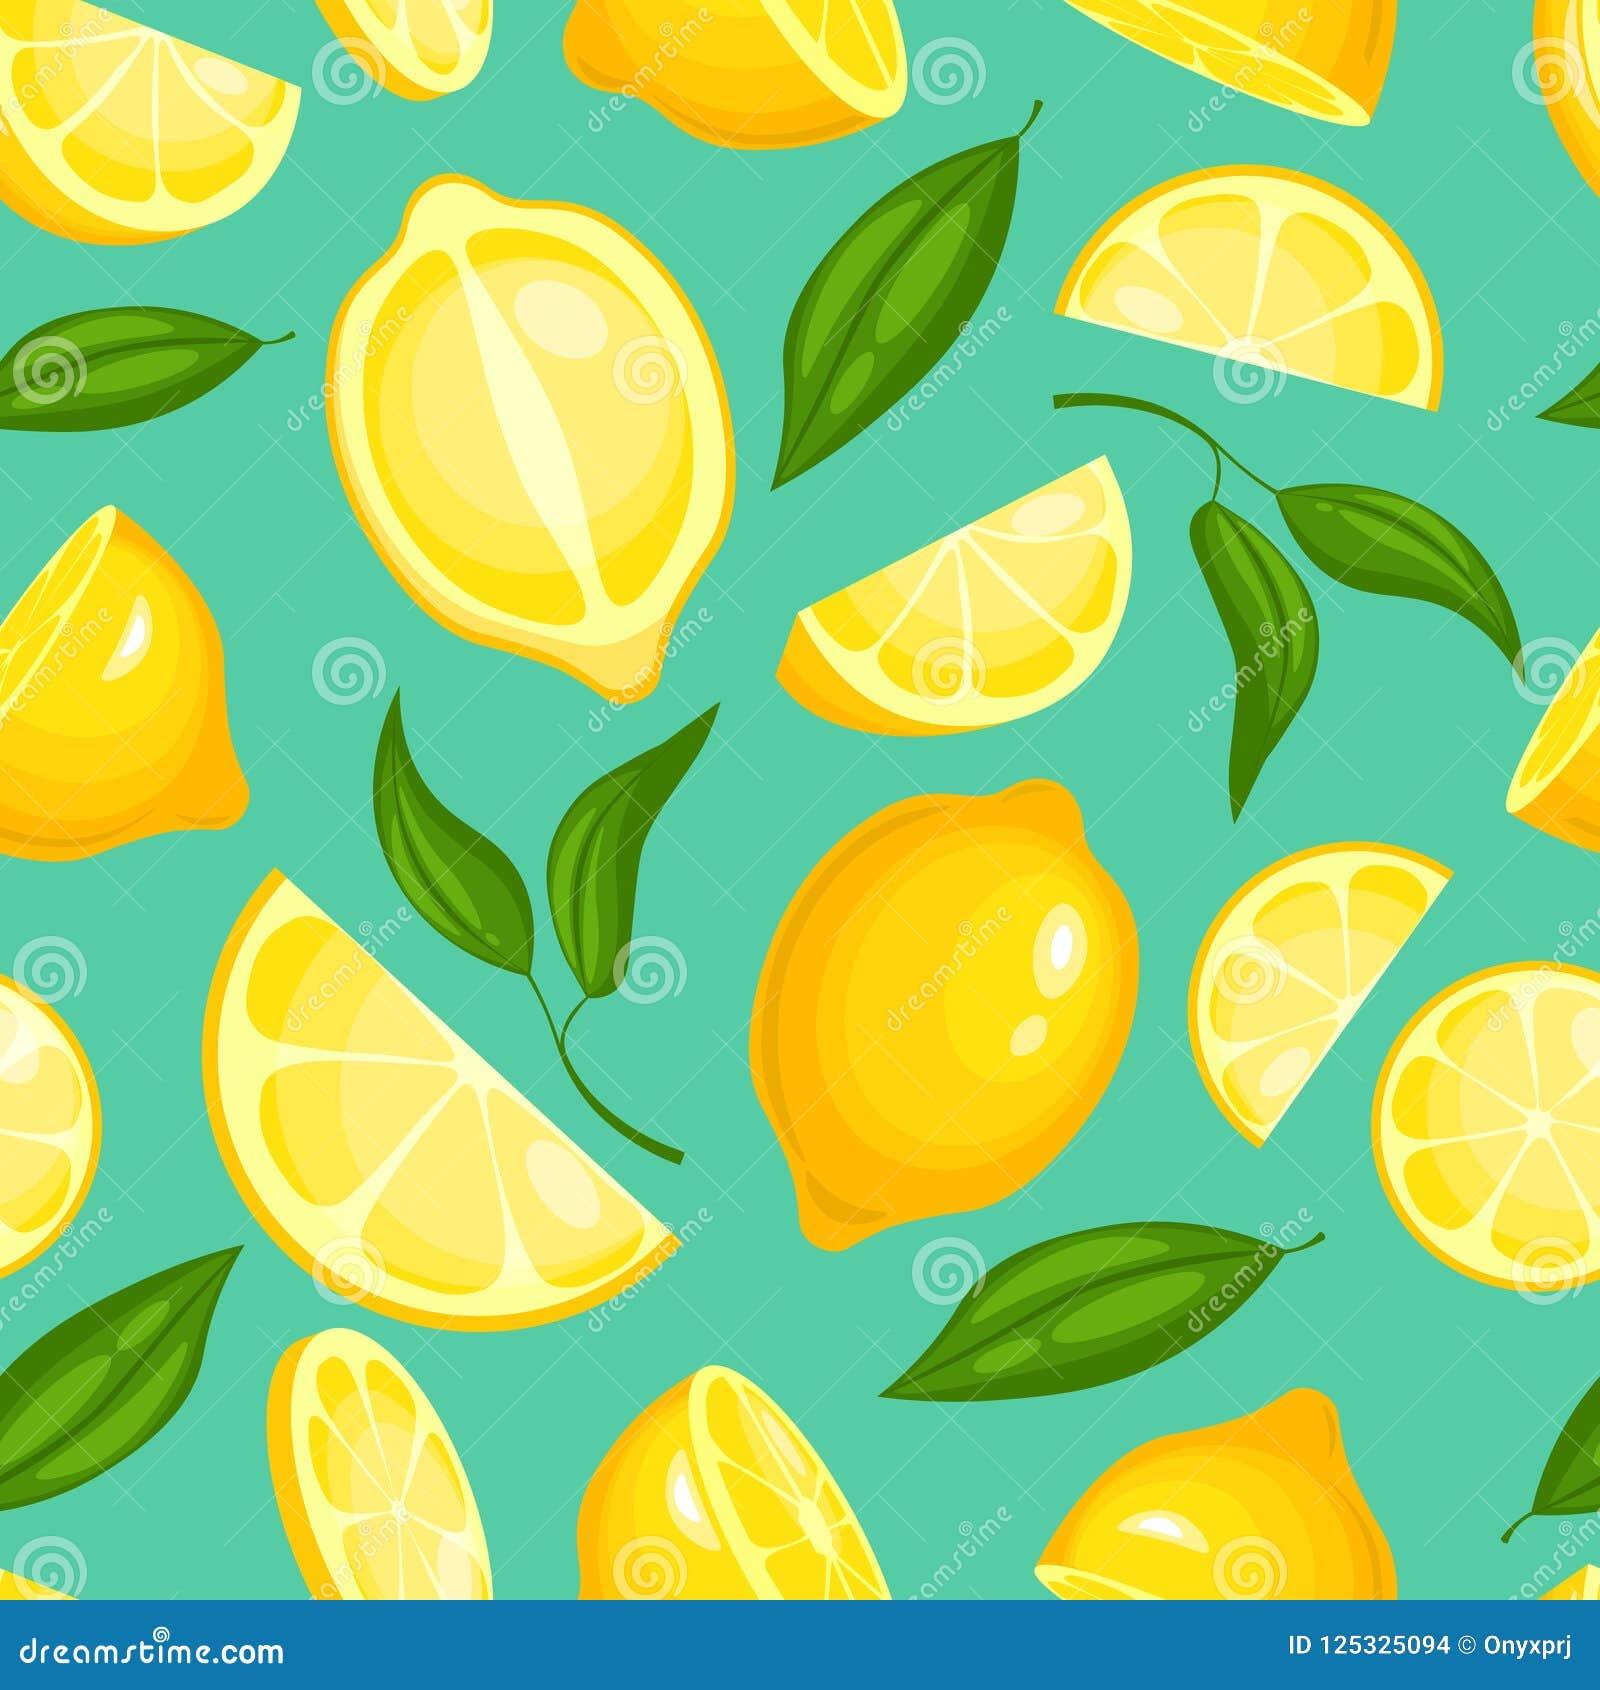 Lemon Pattern Lemonade Exotic Yellow Juicy Fruit With